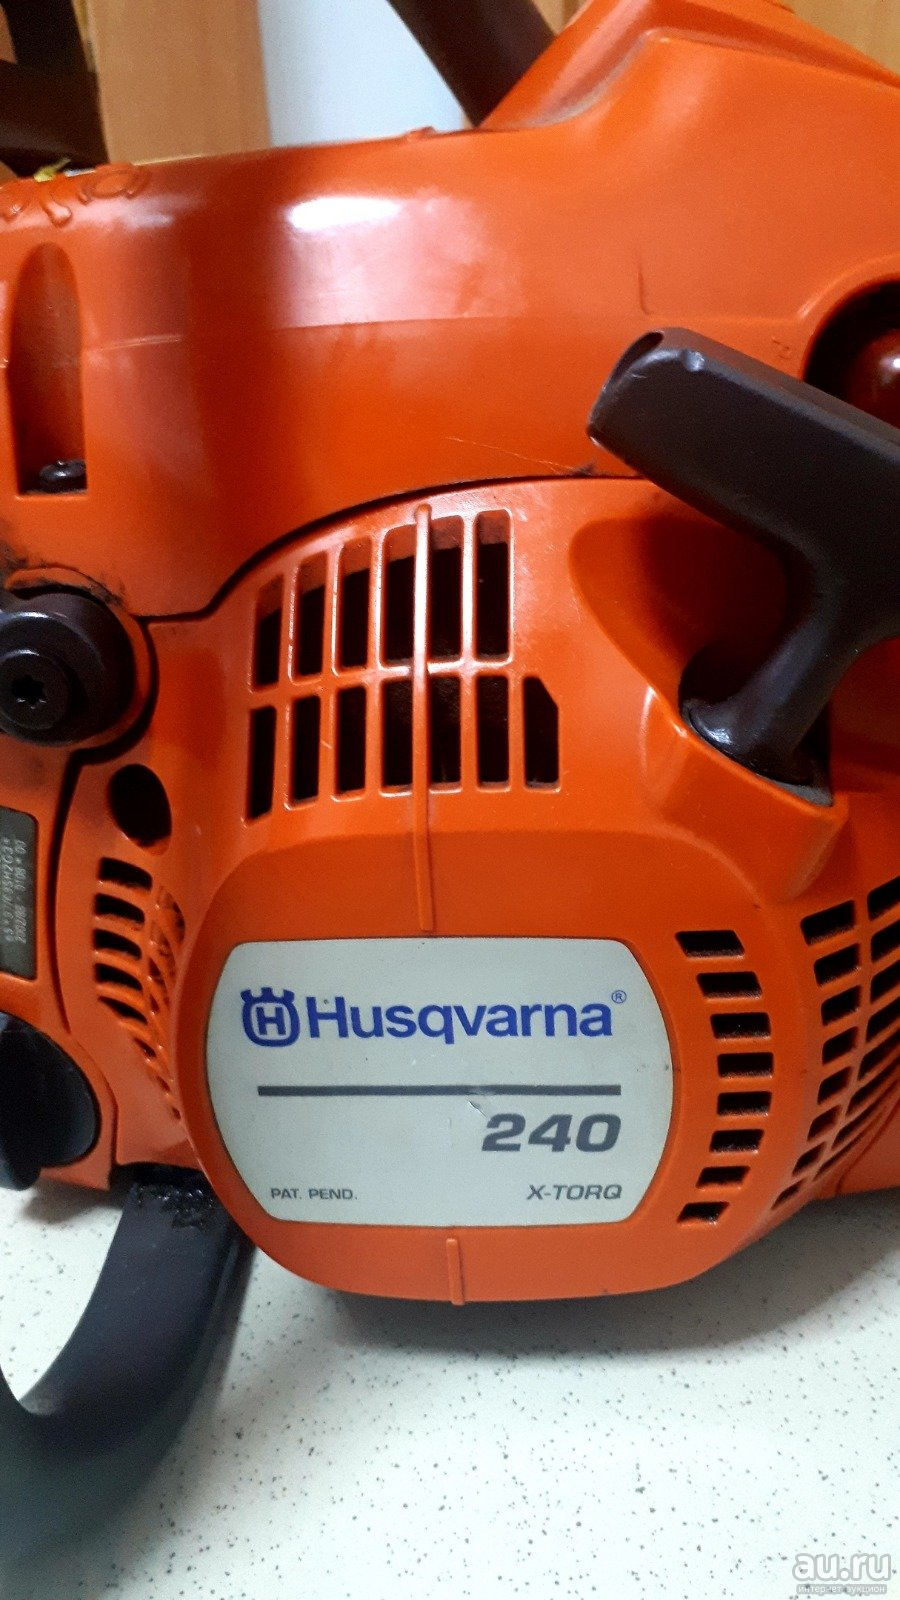 Бензопила хускварна (husqvarna) 240 — характеристики, регулировка